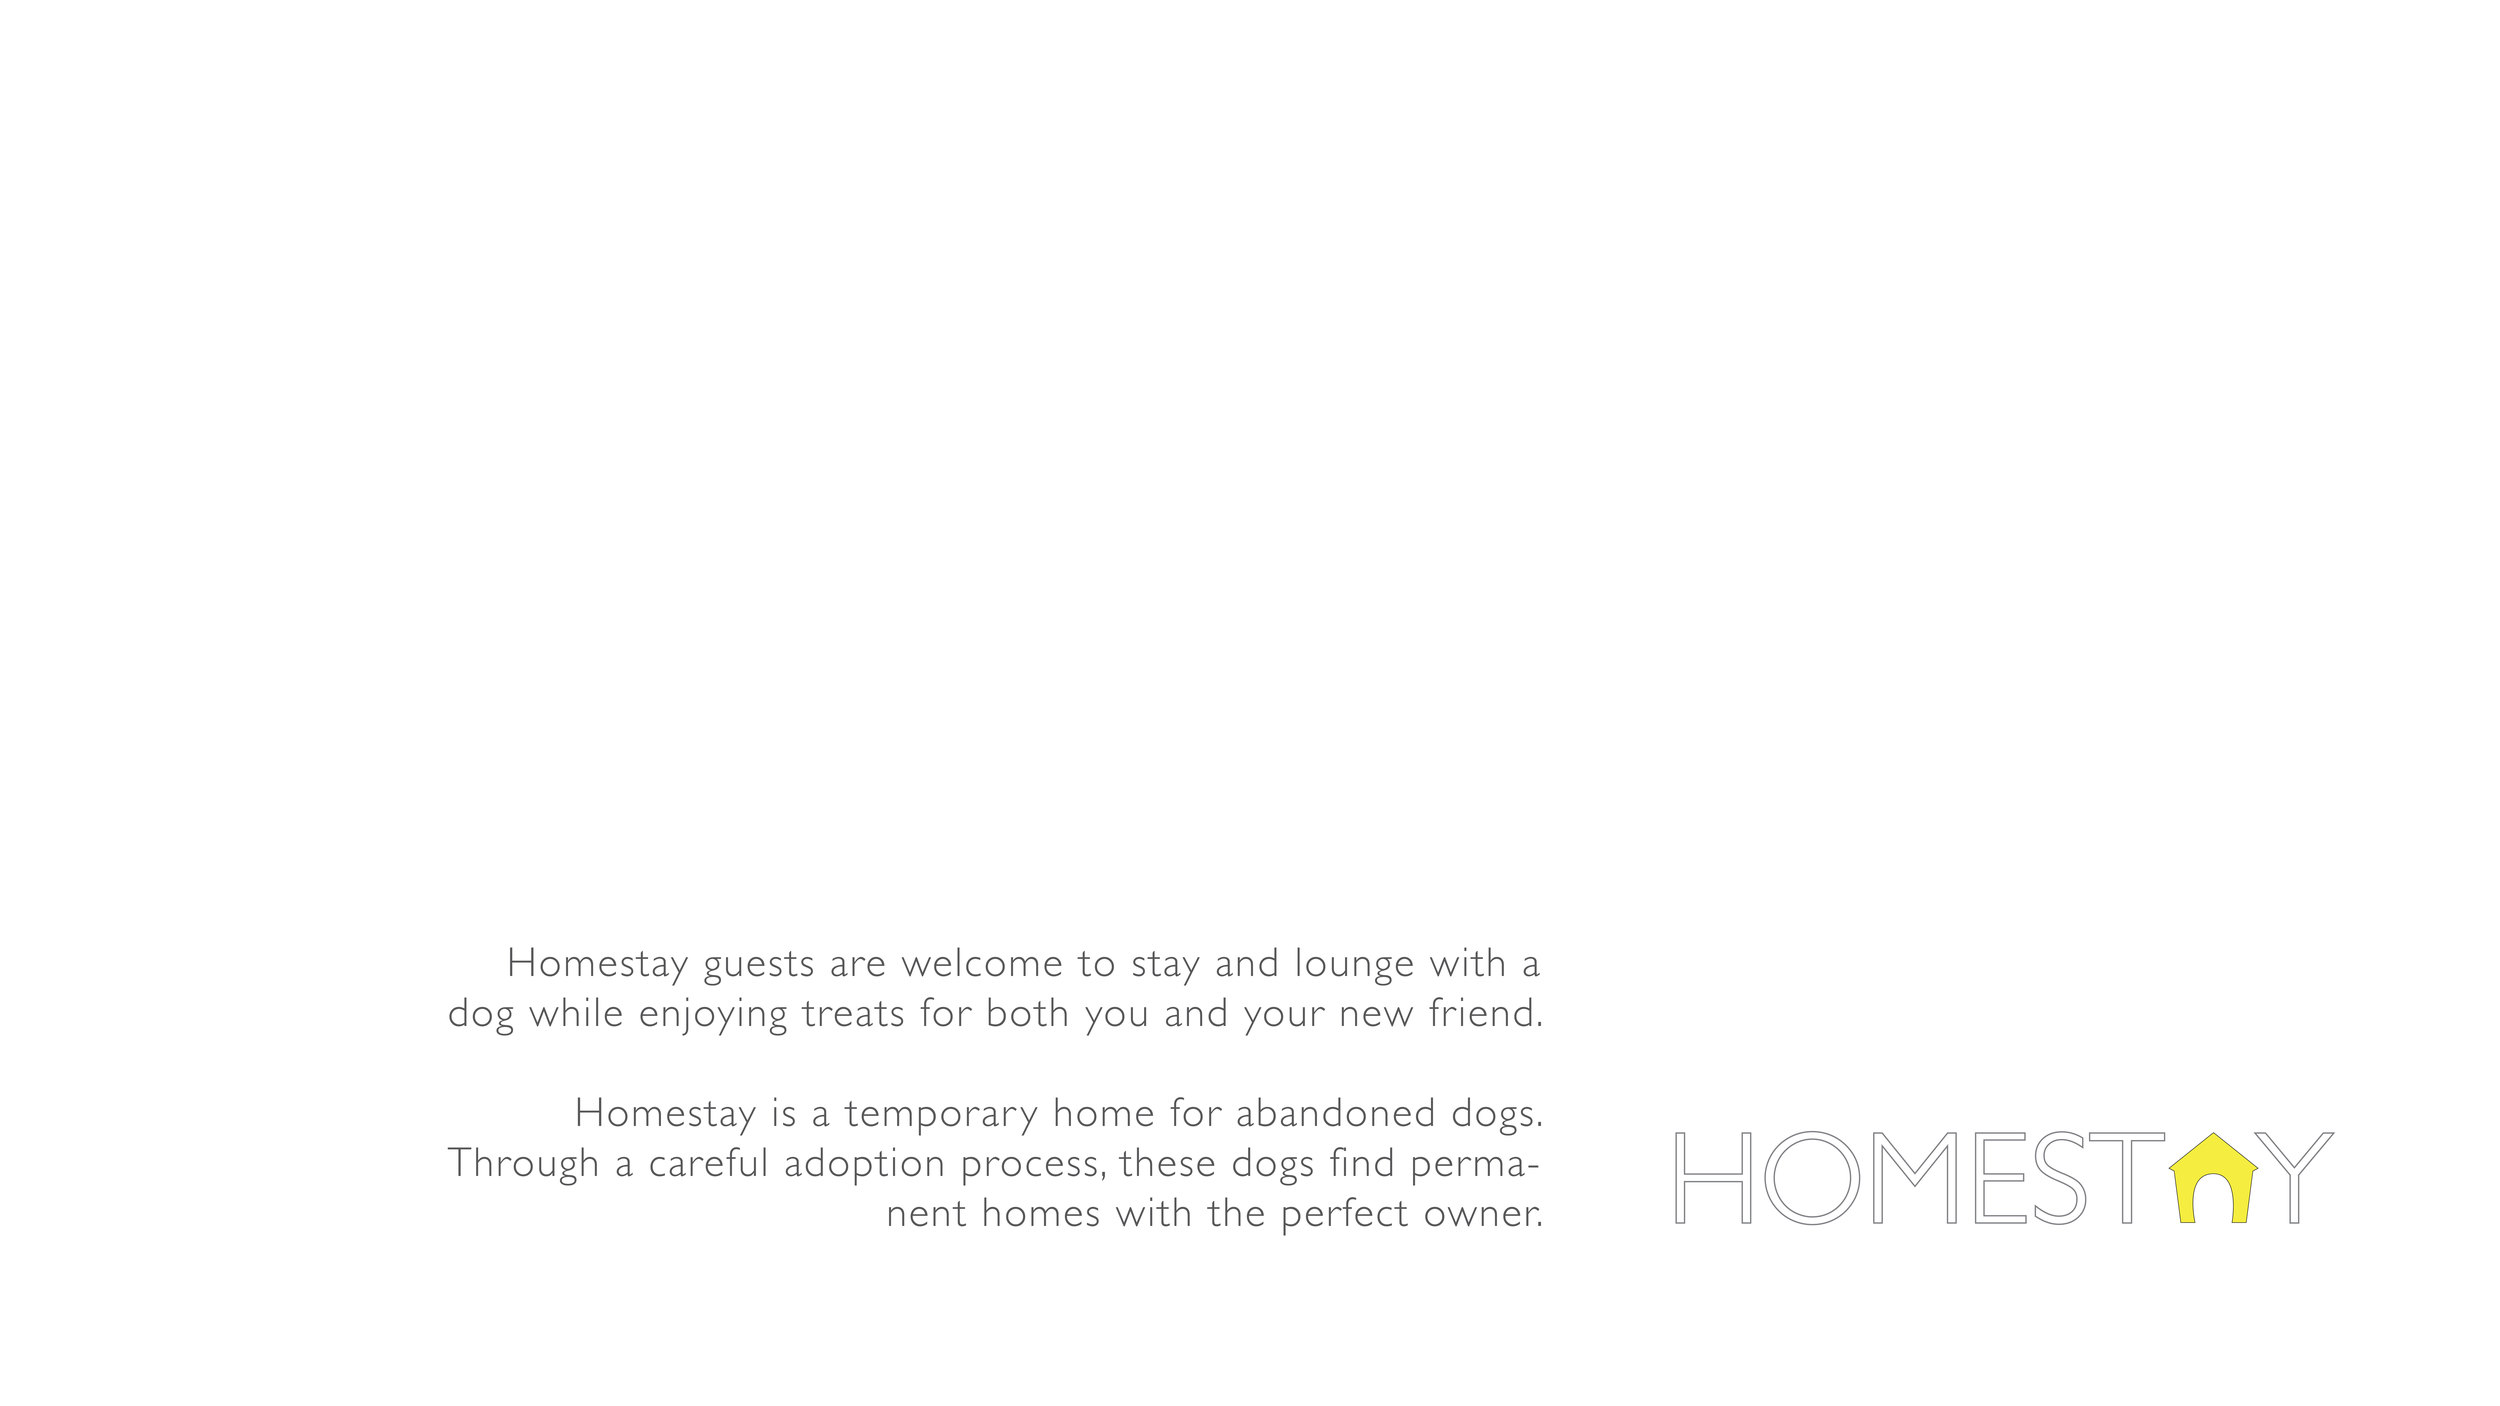 homestay website-04.jpg